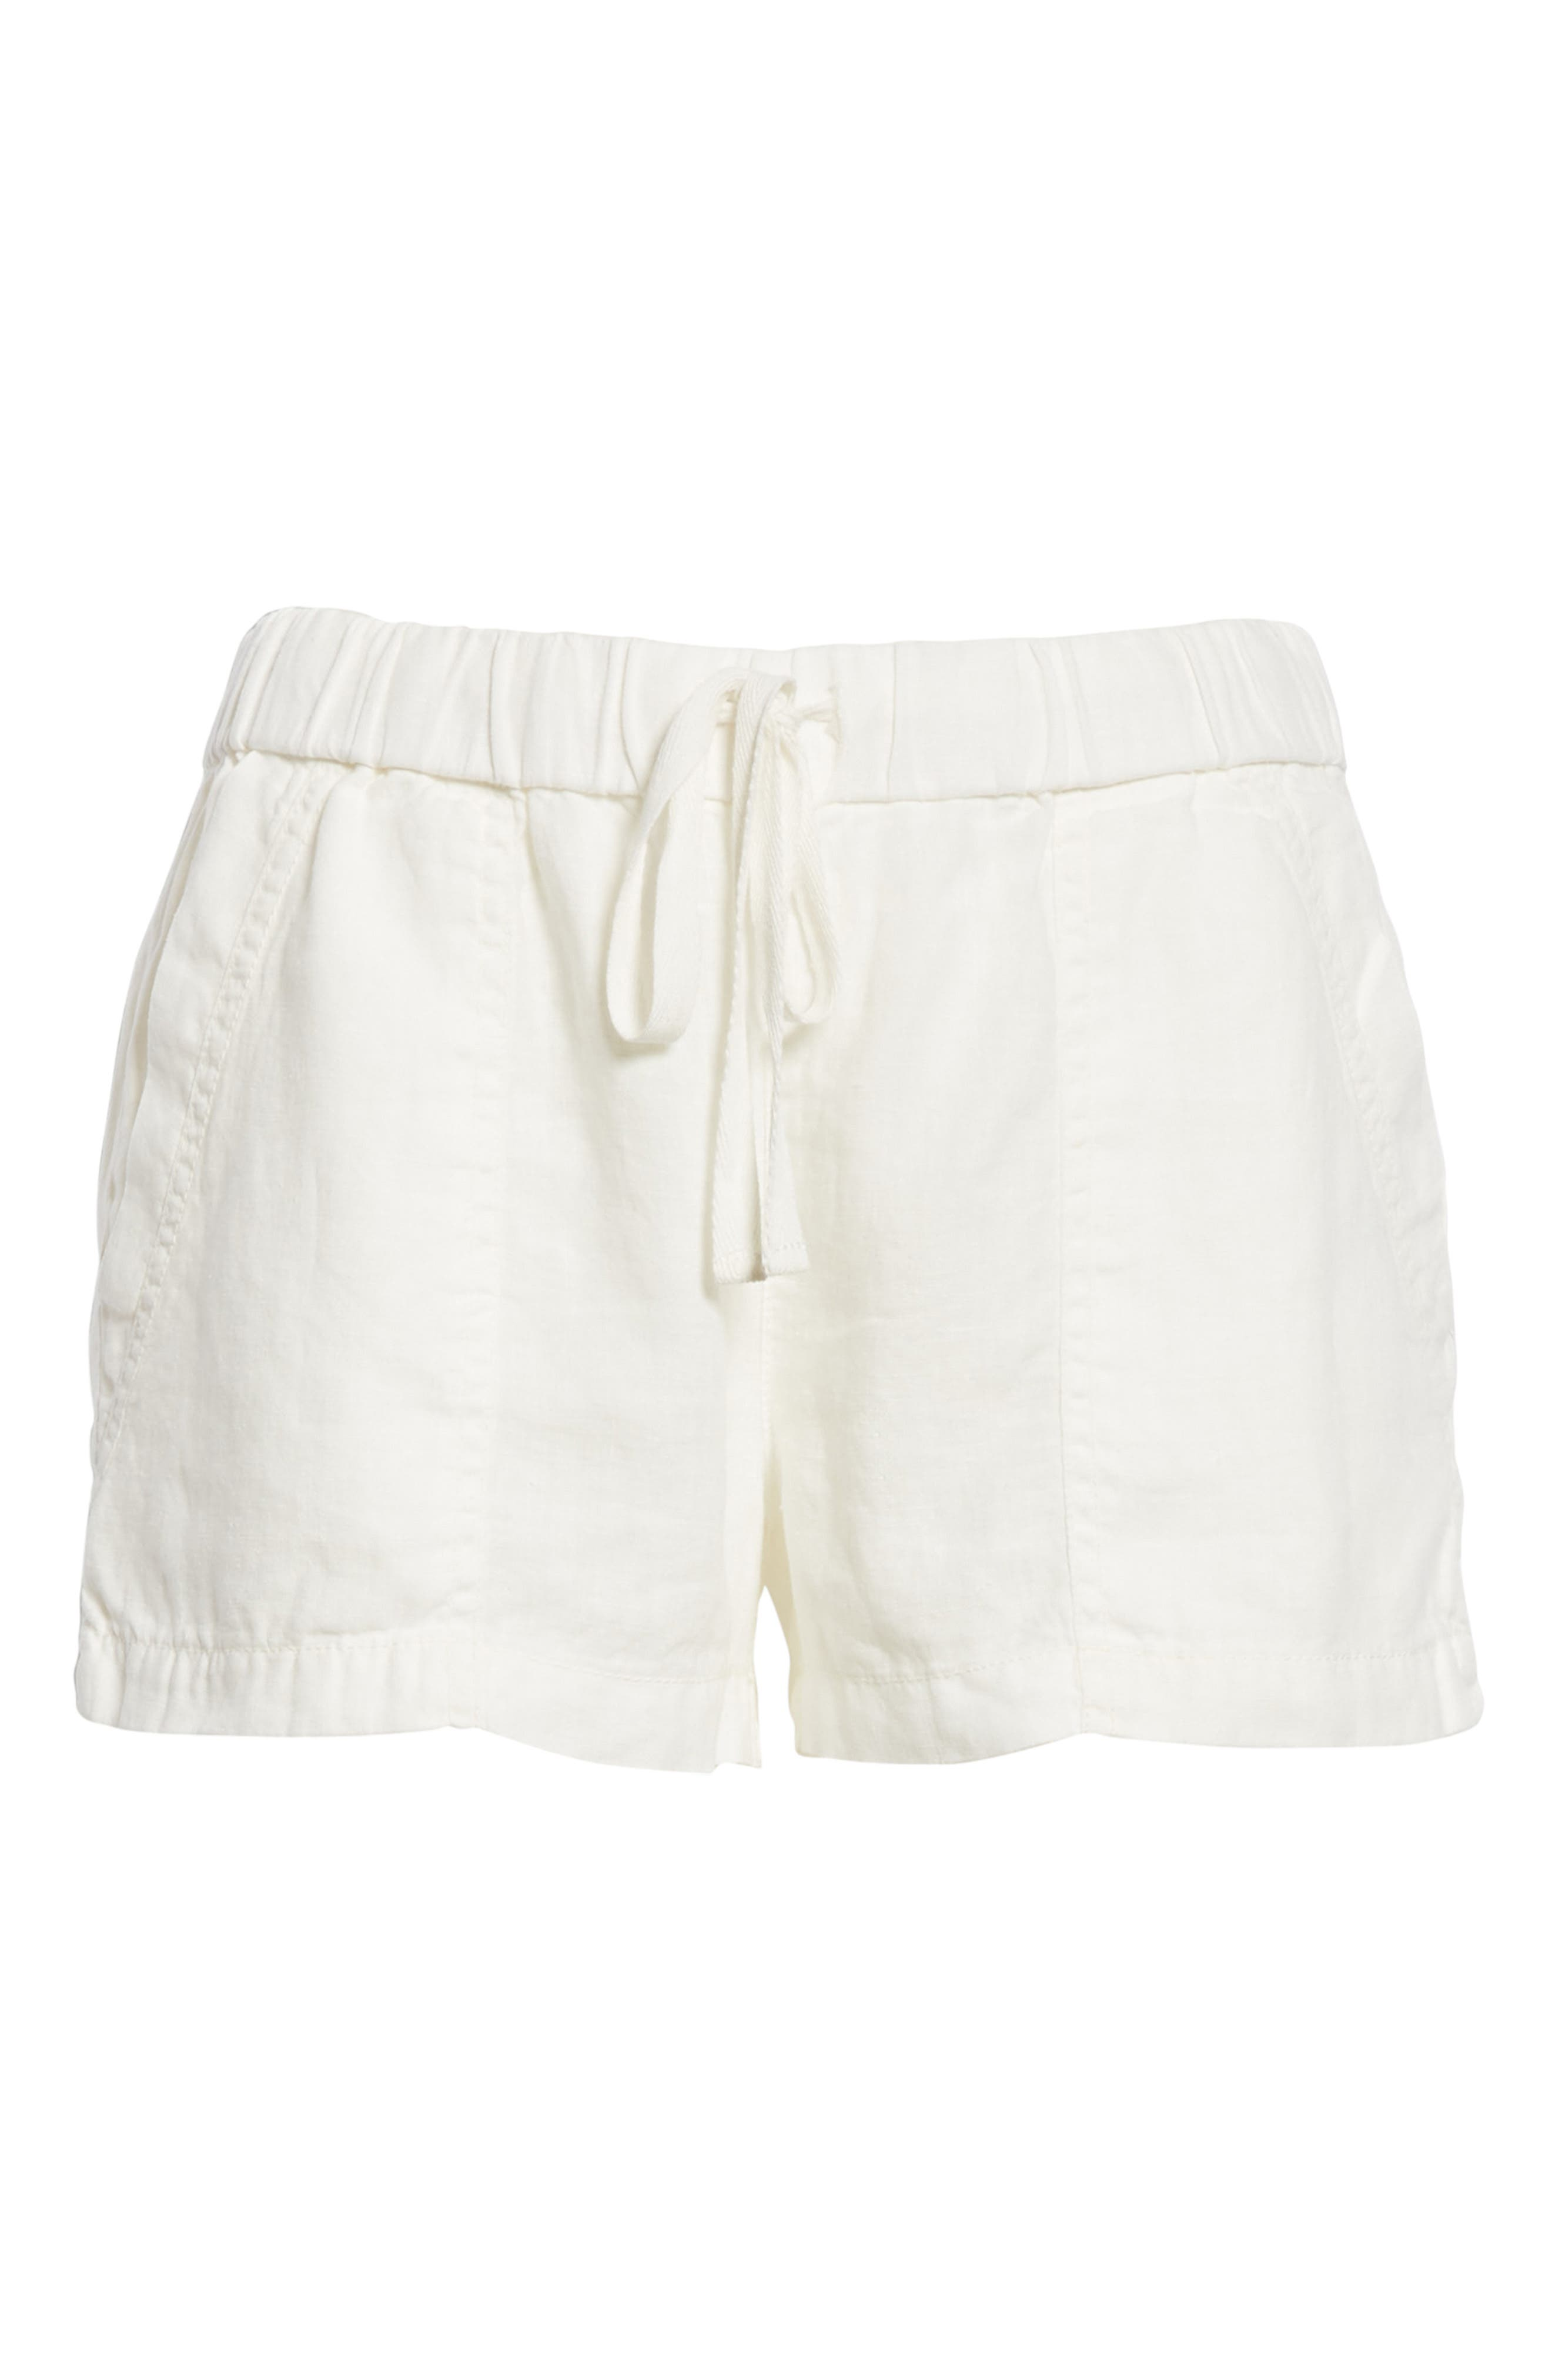 Fosette Linen Drawstring Shorts,                             Alternate thumbnail 6, color,                             Porcelain